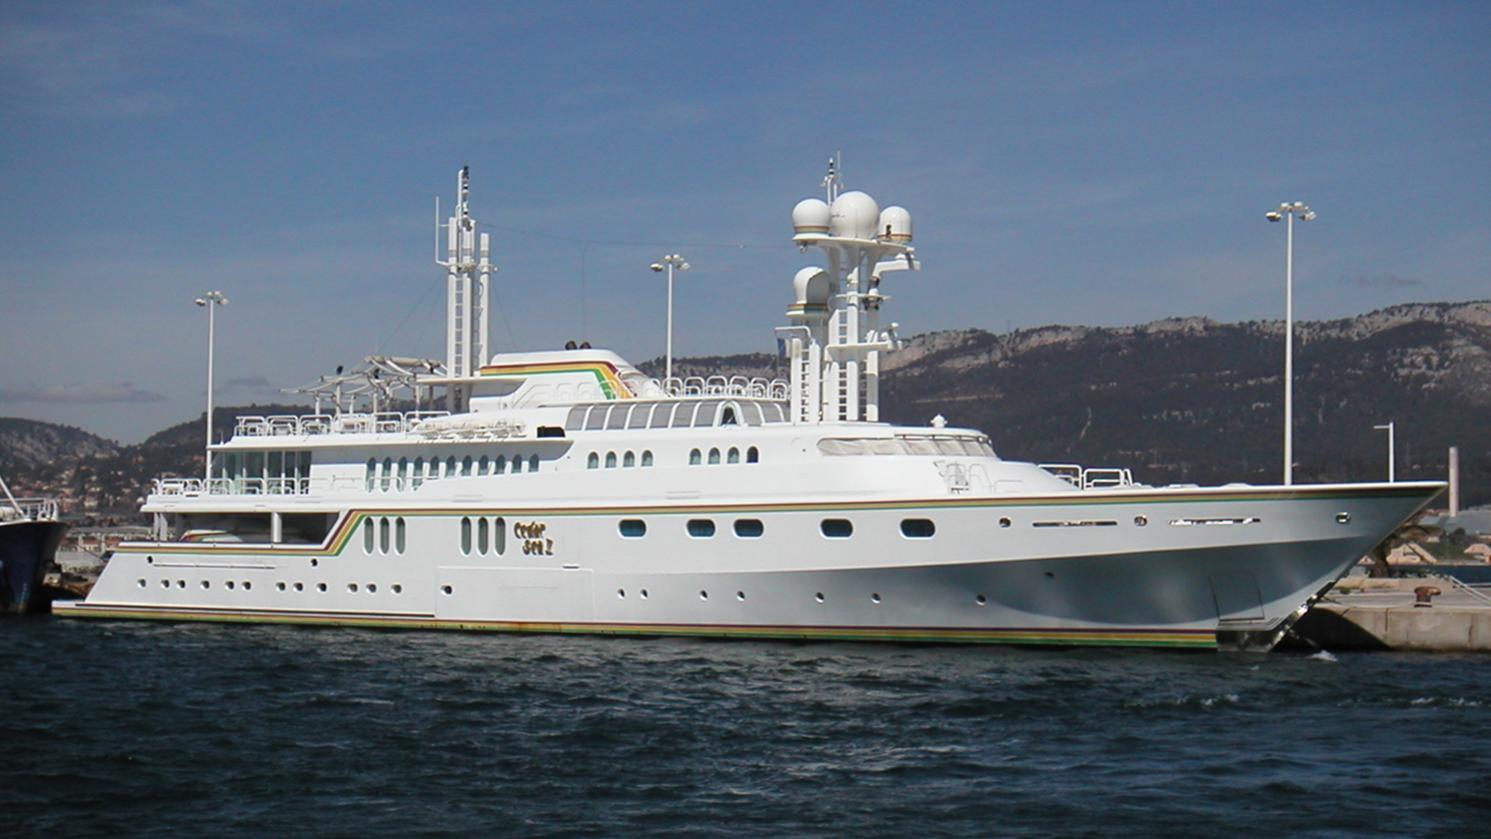 cedar-sea-ii-motor-yacht-feadship-1986-65m-profile